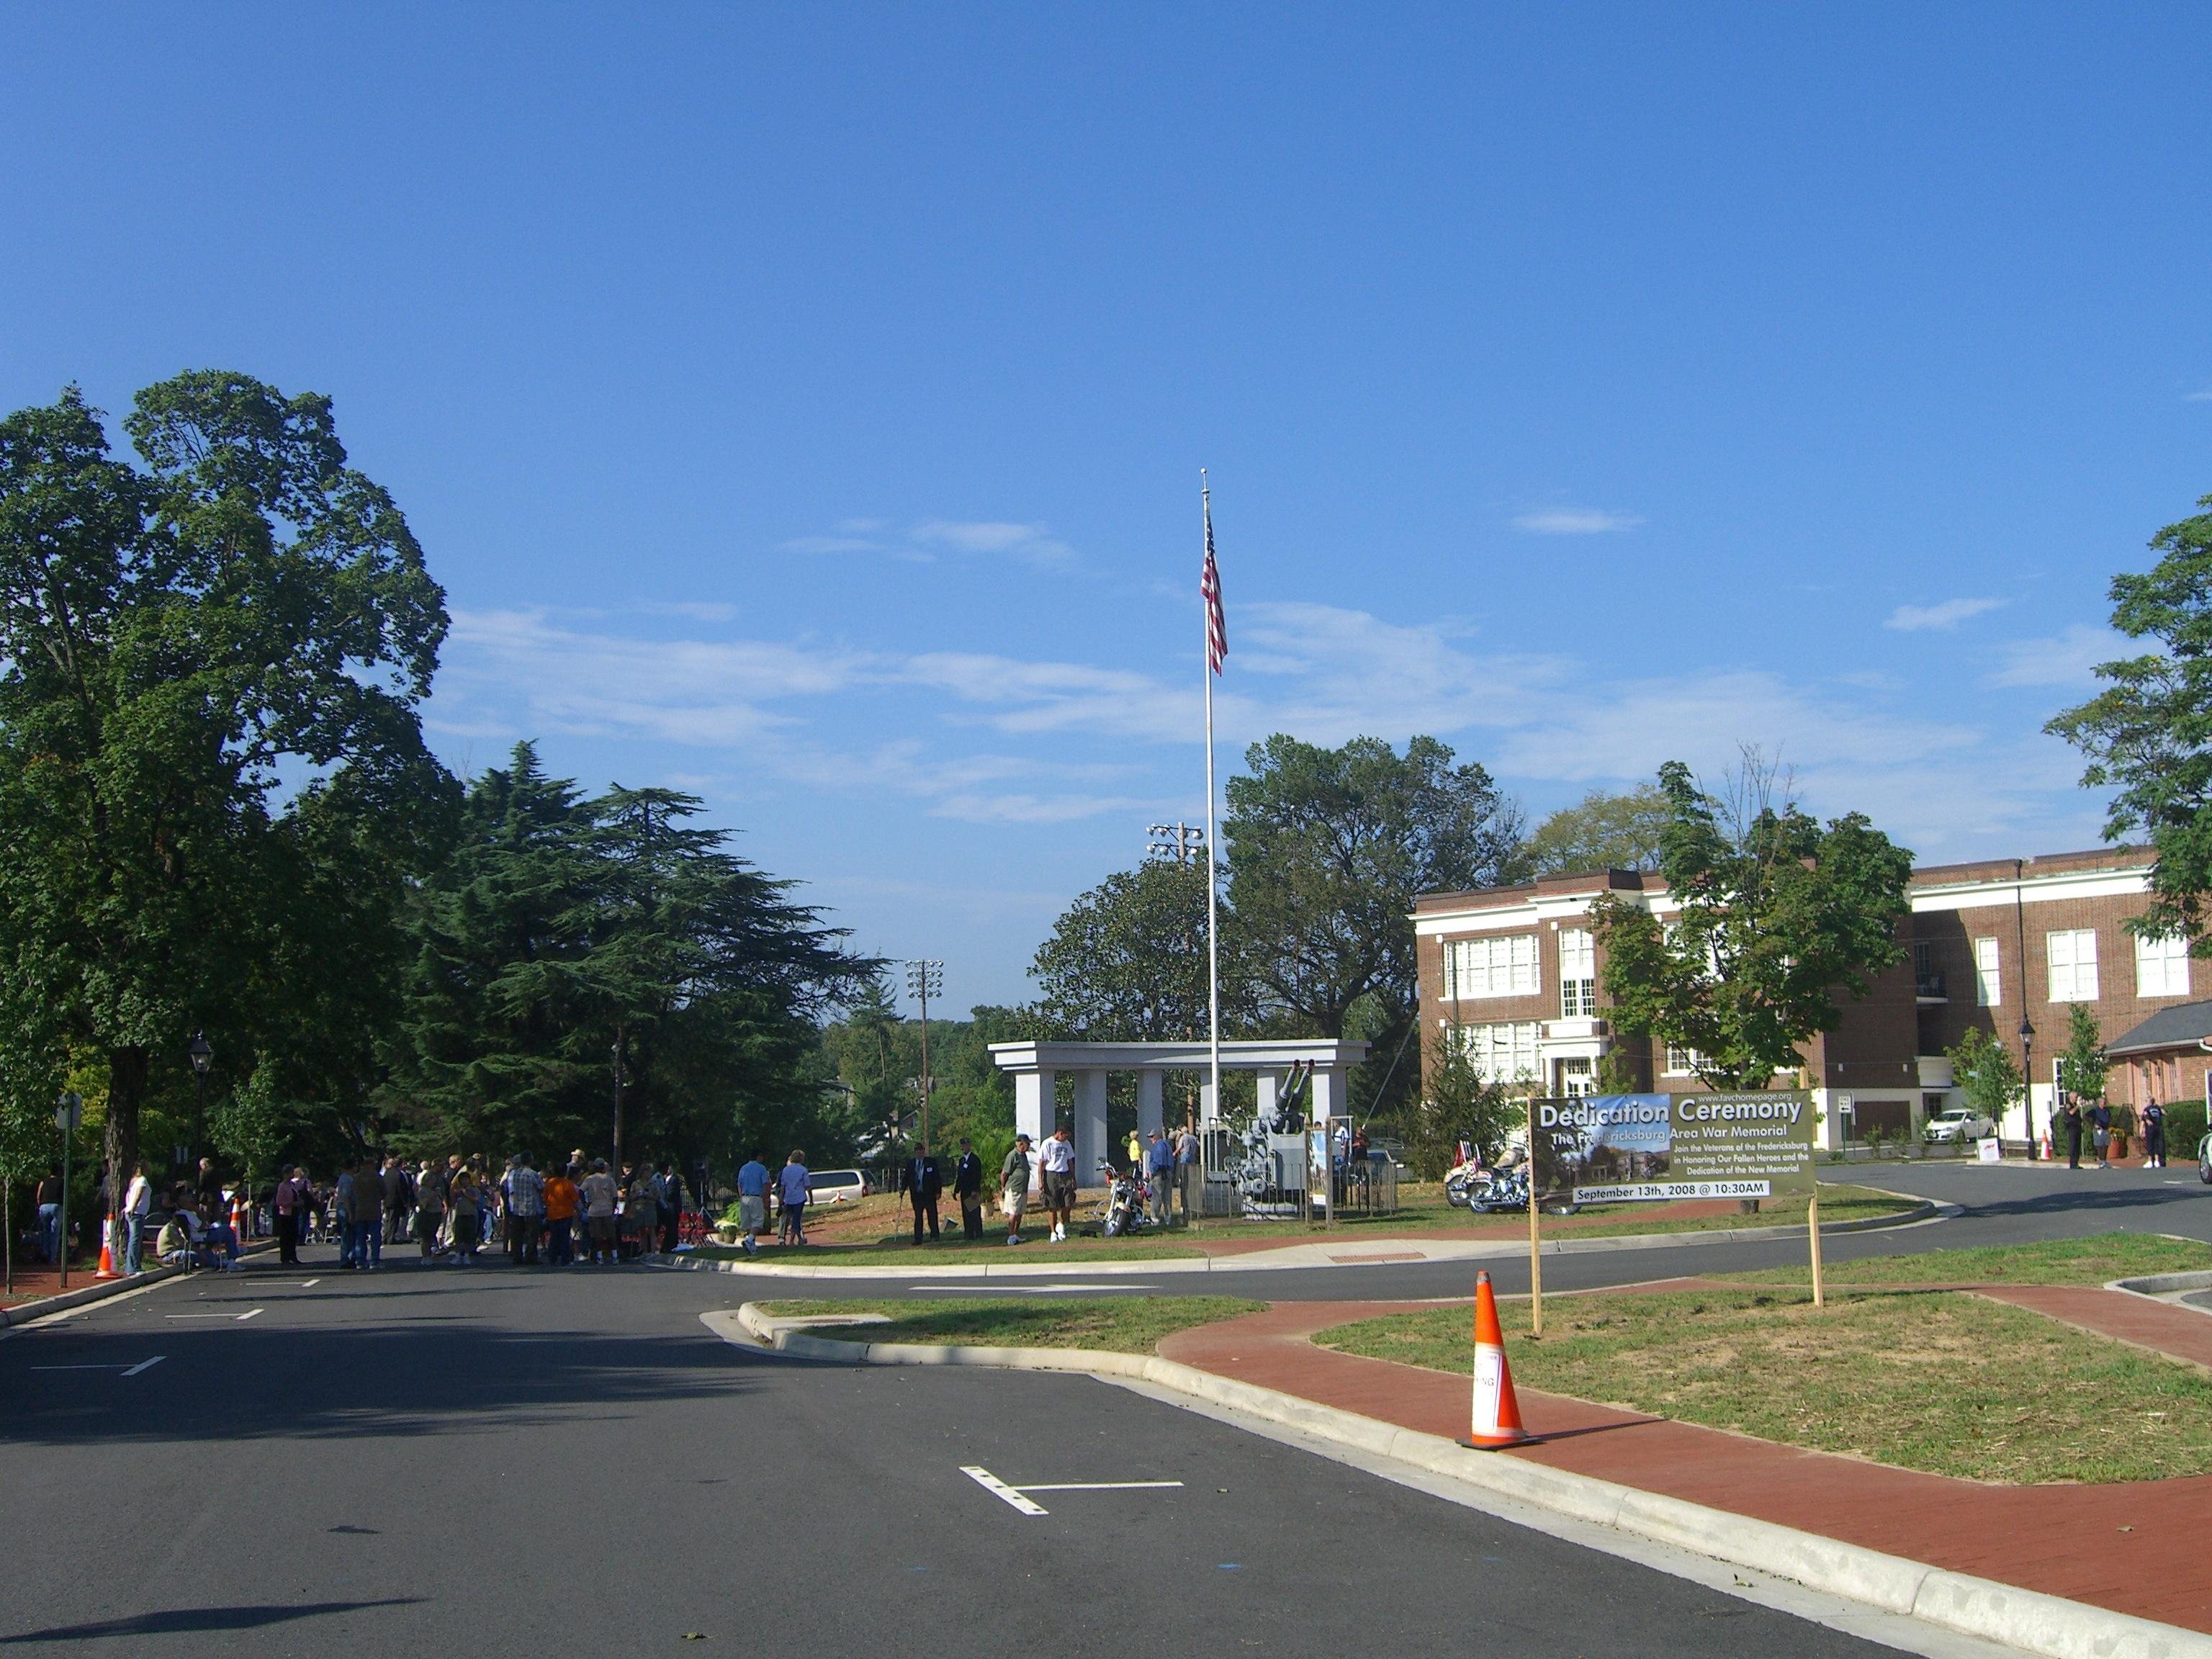 The dedication of the Fredericksburg Area War Memorial on September 13th, 2008